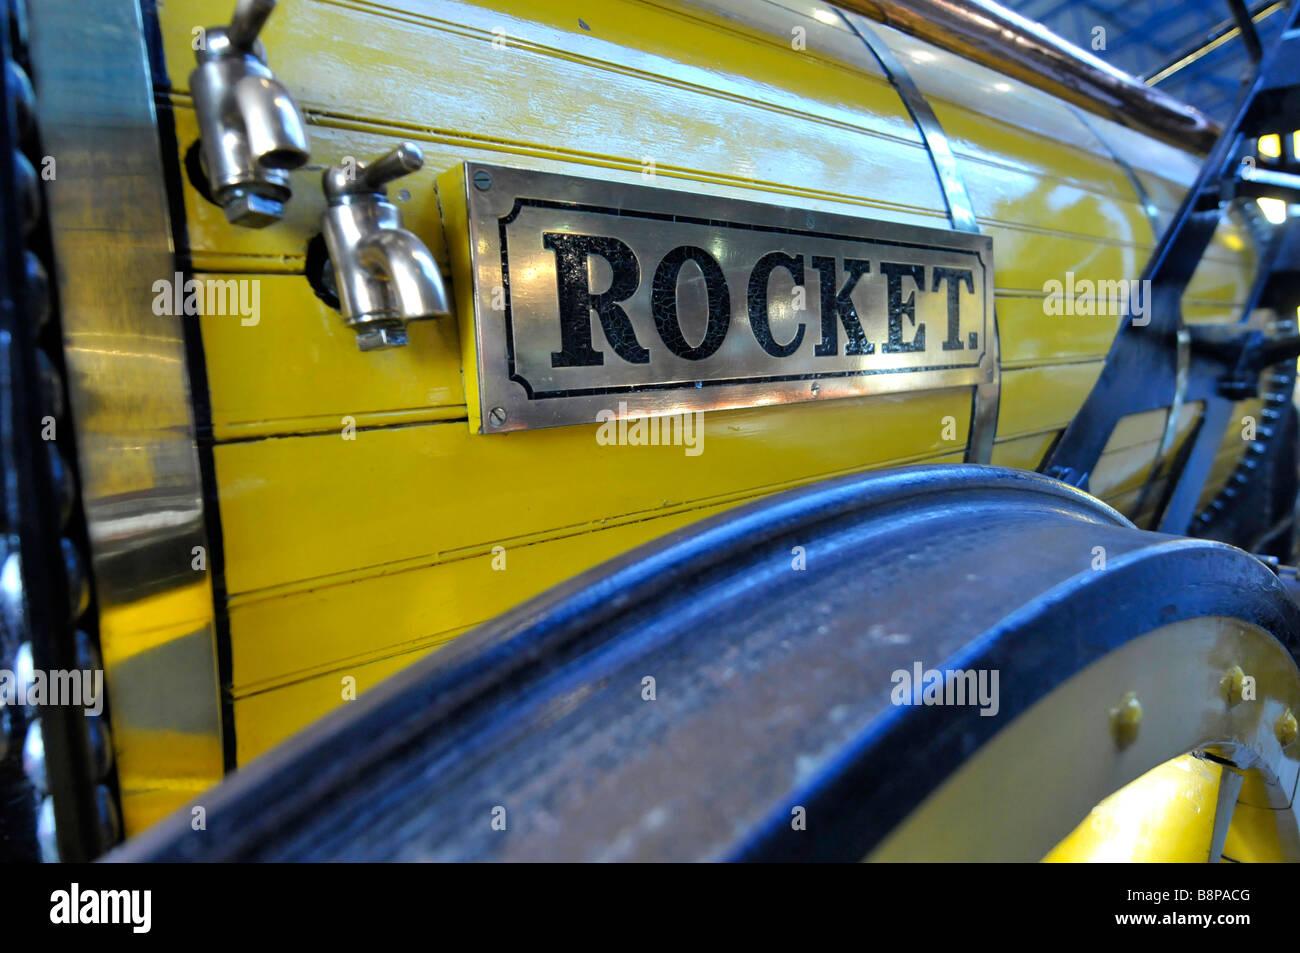 Copy of Rocket at The National Railway Museum, York, Britain, UK - Stock Image